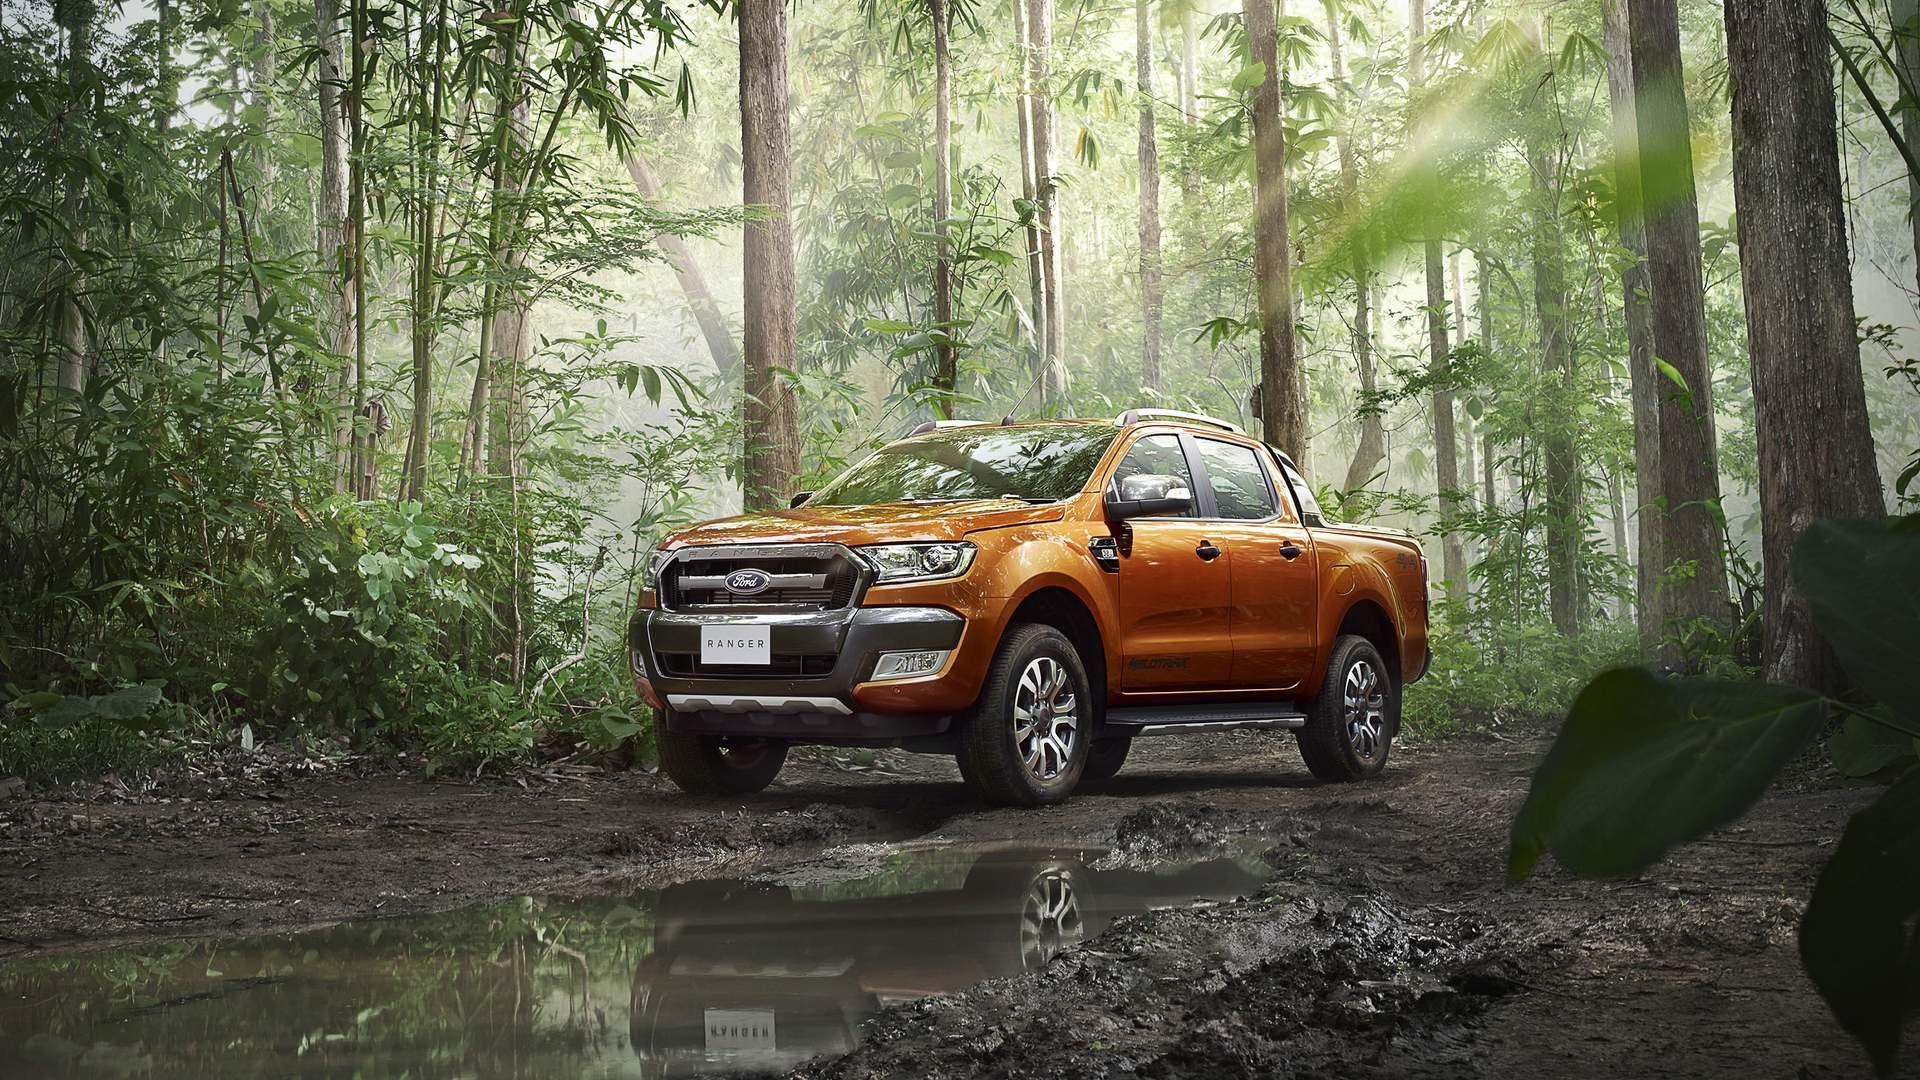 2015 Ford Ranger Wildtrak Wallpaper Kalabasa 2019 Ford 2019